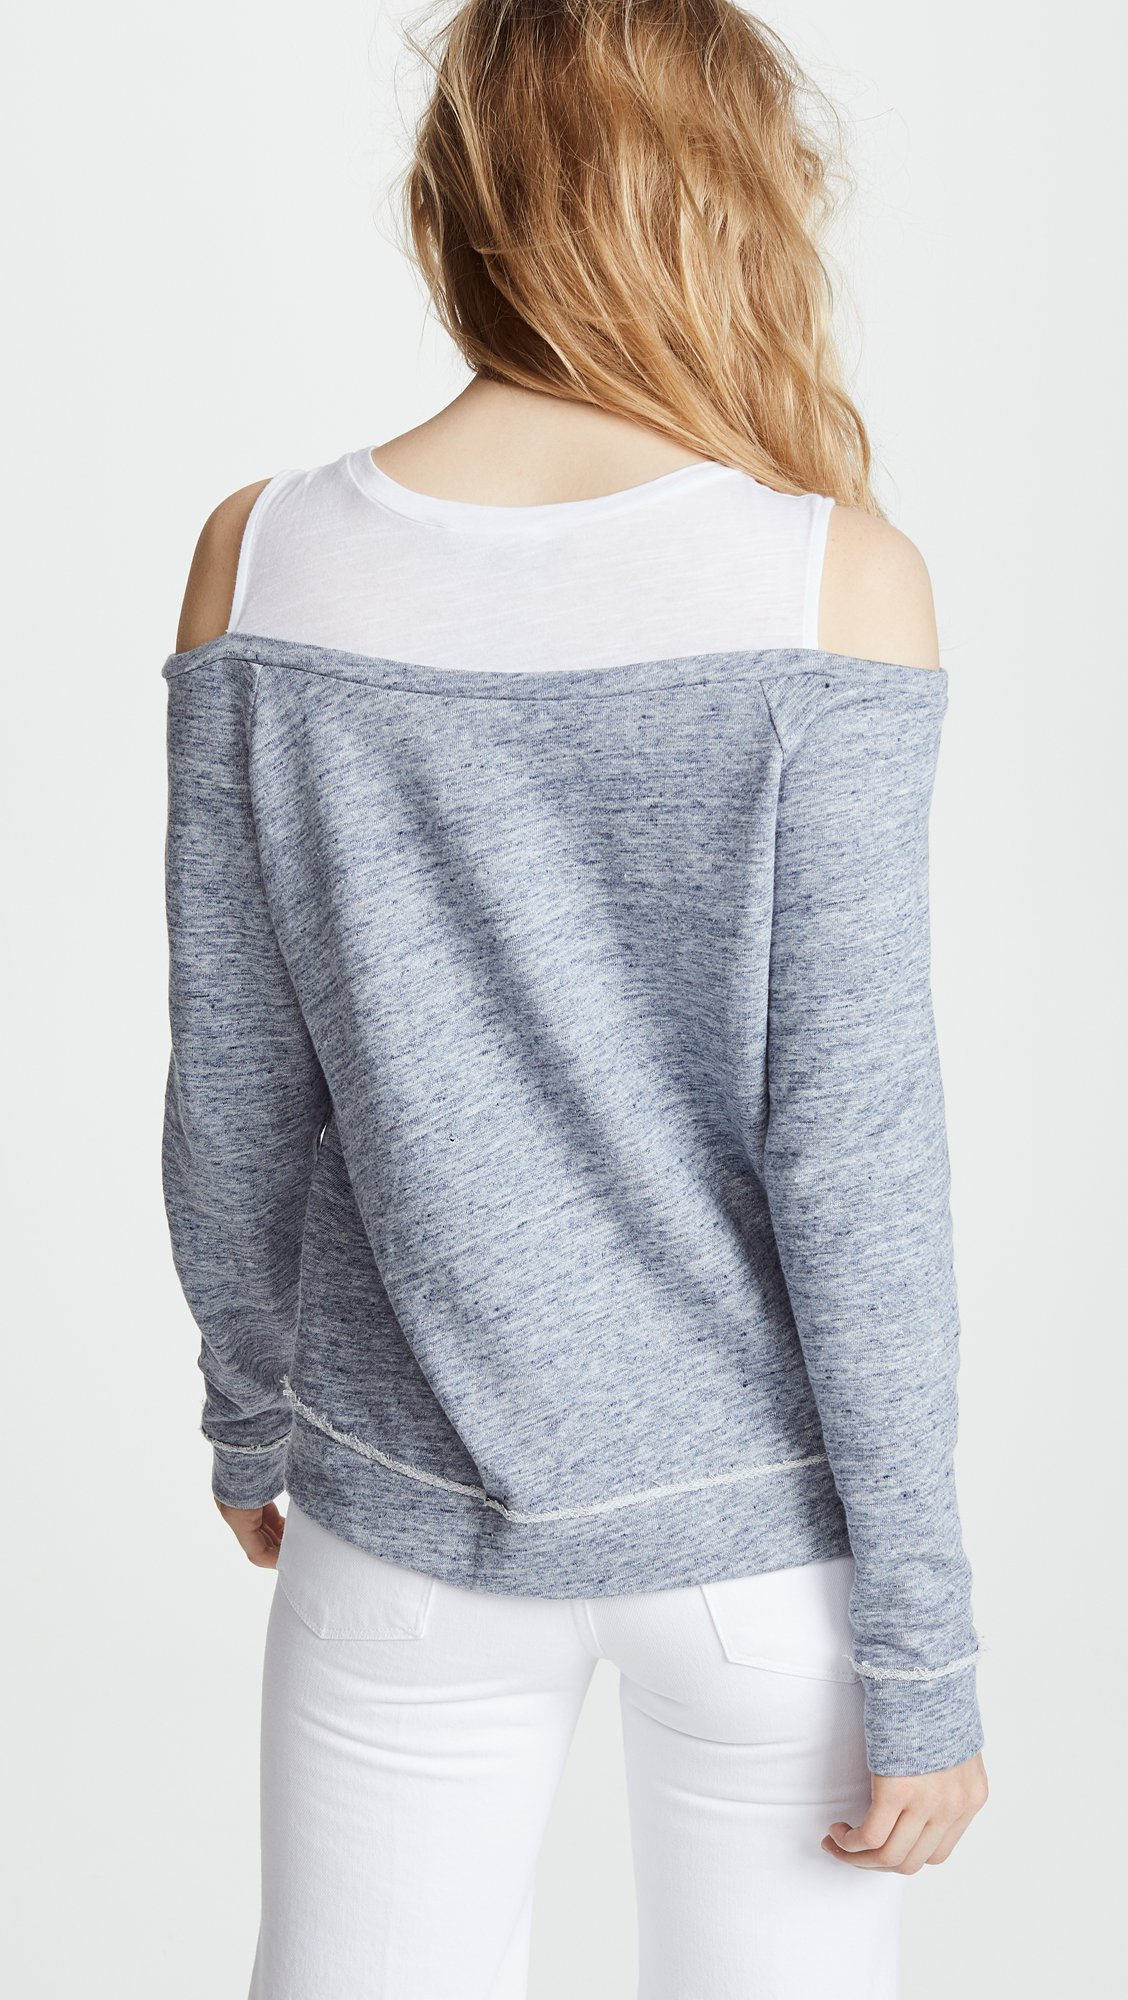 Generation Love Women's Roni Double Layered Sweatshirt, Heather Blue, Small by Generation Love (Image #3)